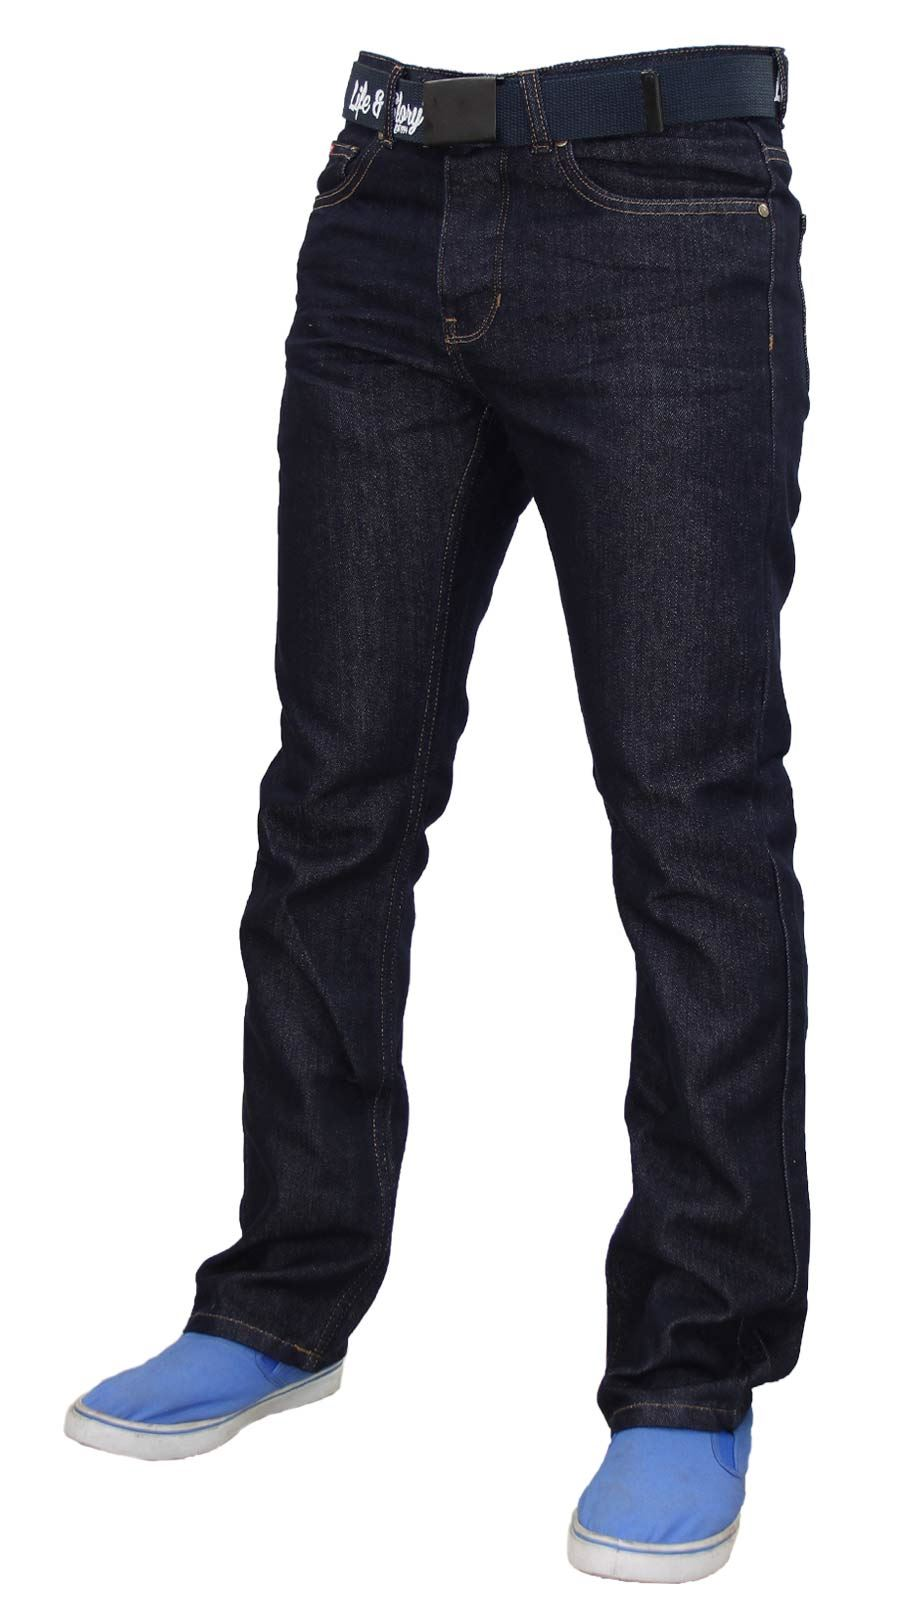 Men-Regular-Fit-Jeans-Denim-Button-Fly-Straight-Leg-Trouser-Pant-With-Free-Belt thumbnail 14